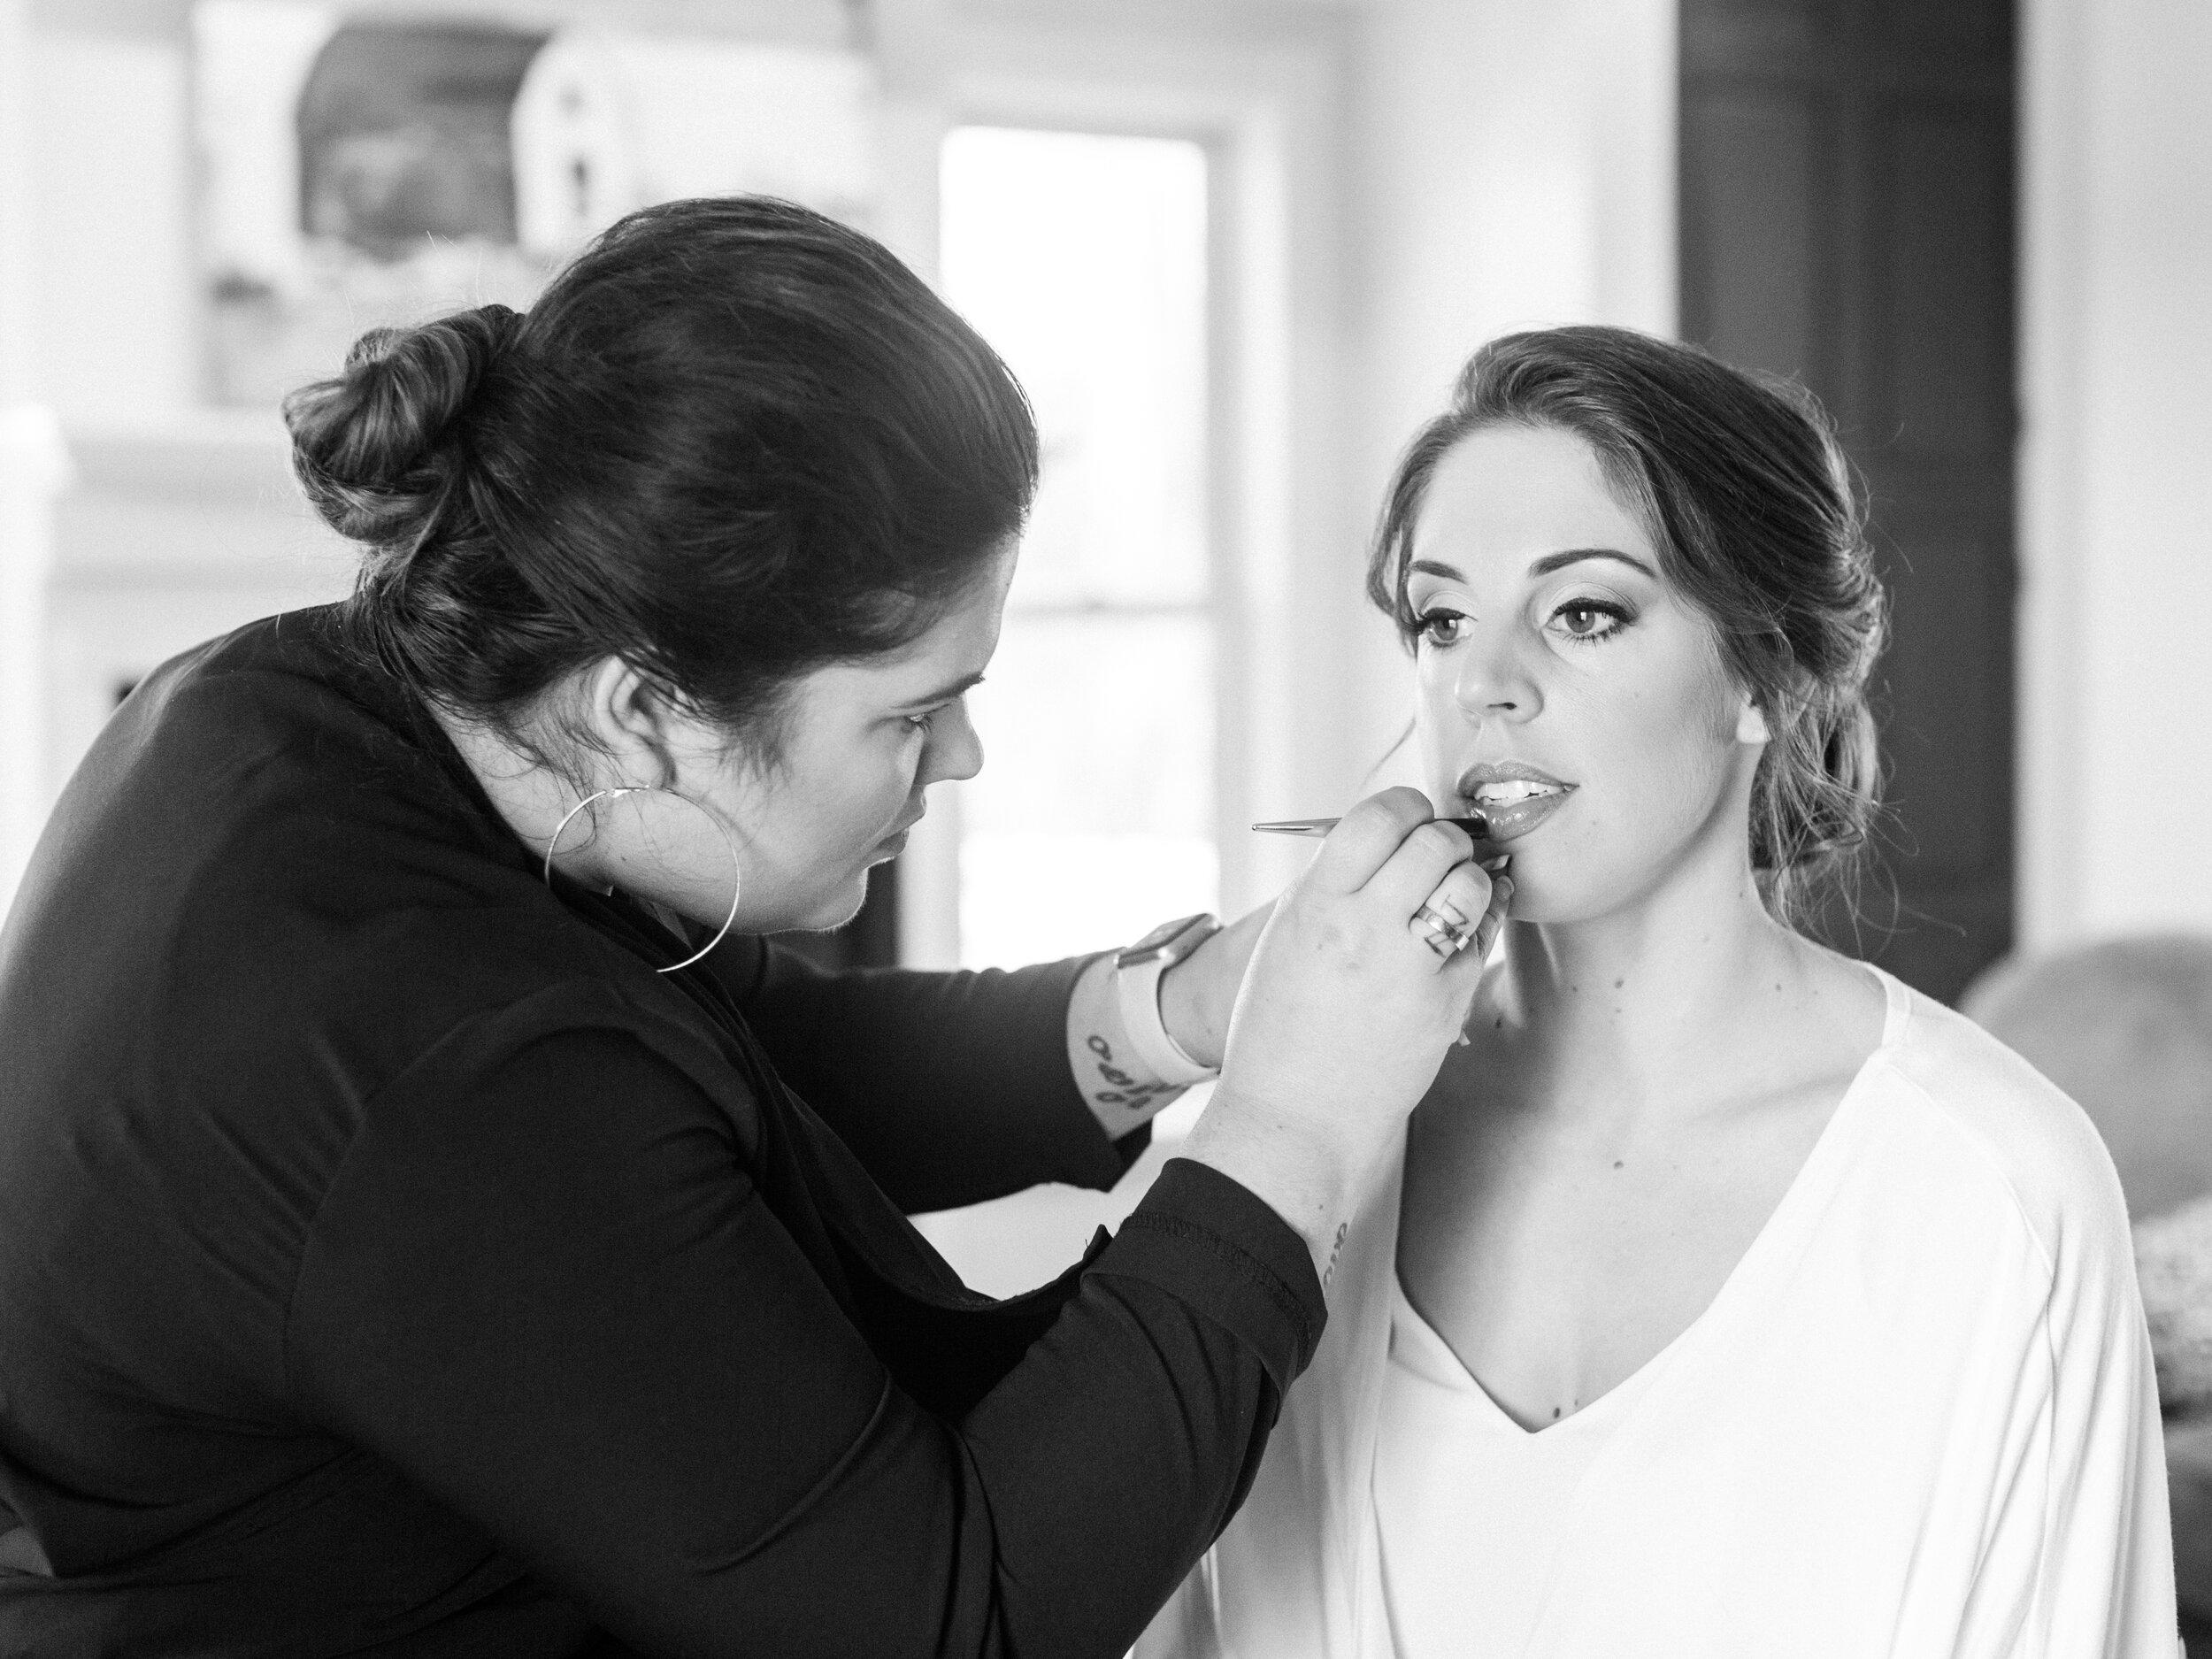 Steinlage+Wedding+Getting+Ready-12.jpg